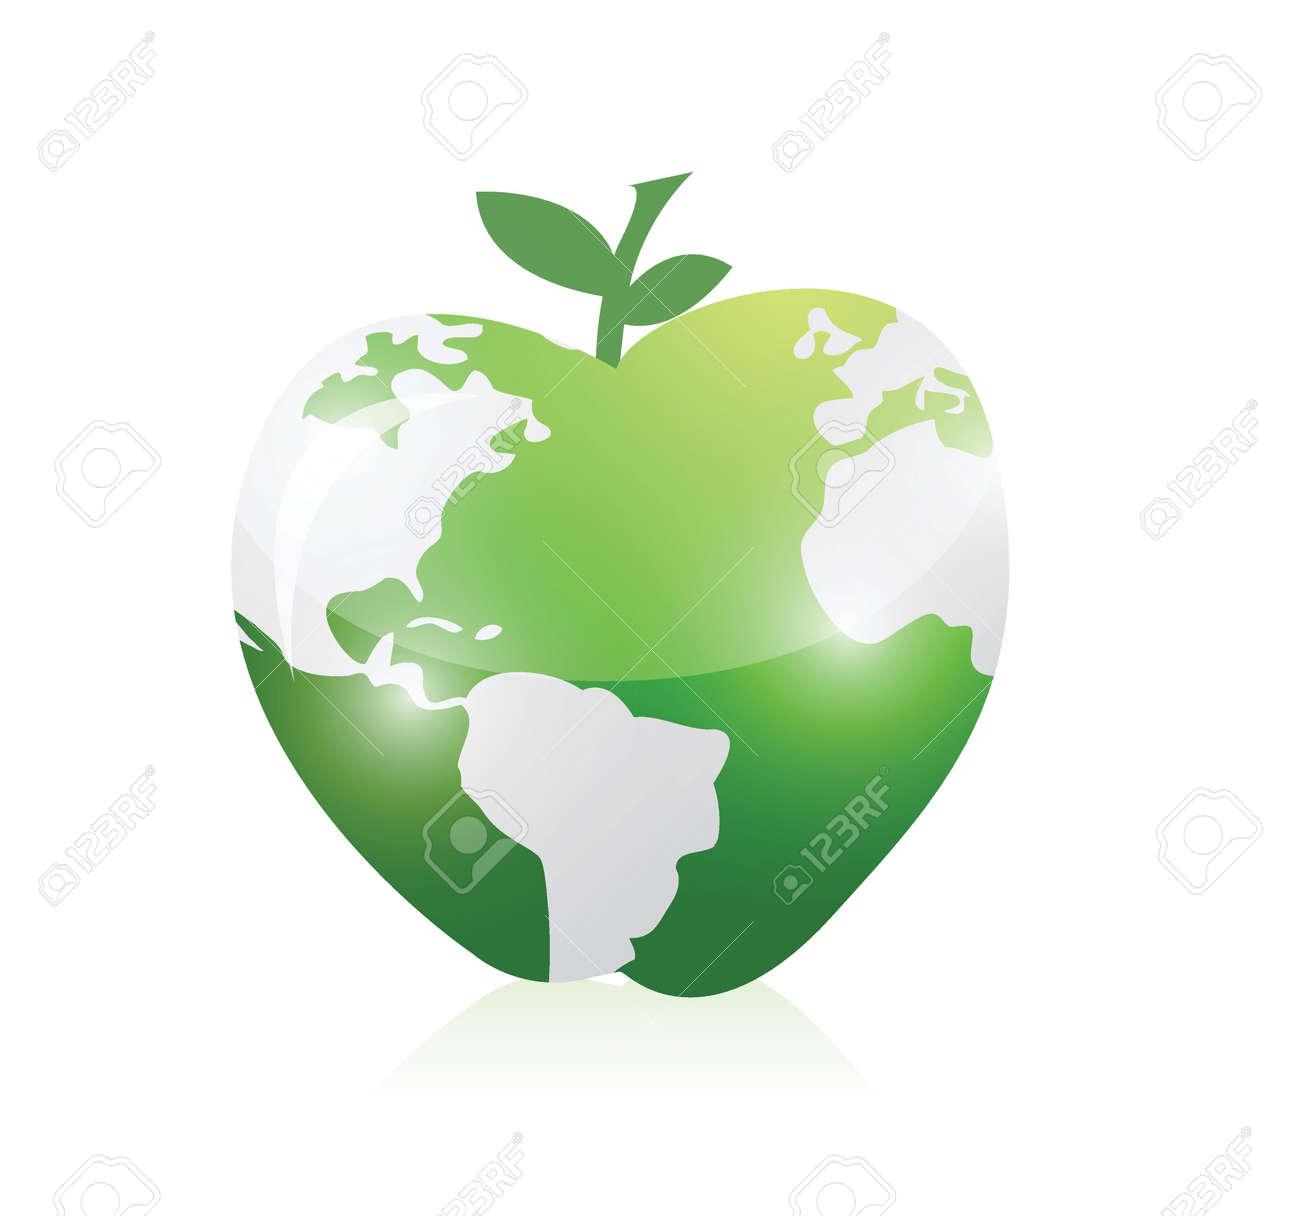 Green world map apple illustration design over a white background green world map apple illustration design over a white background stock vector 24928847 gumiabroncs Choice Image